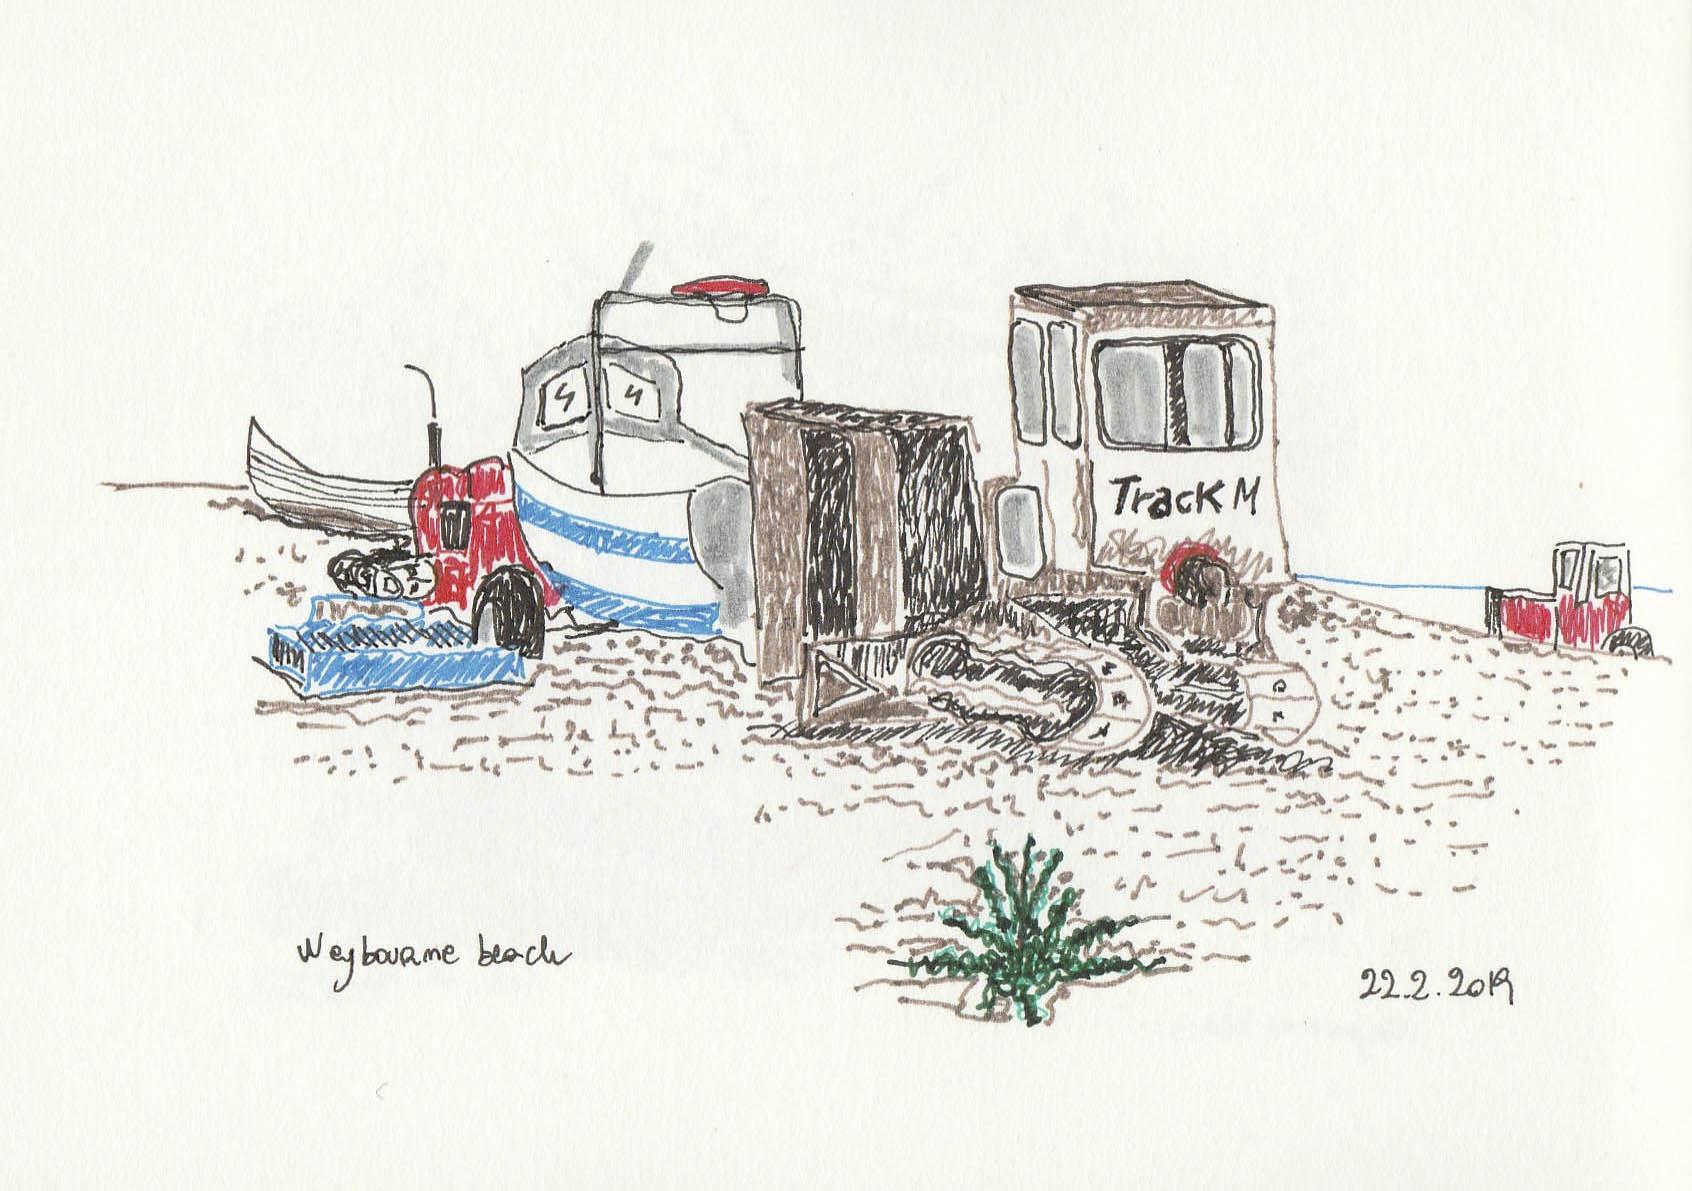 Tractor Weybourne beach